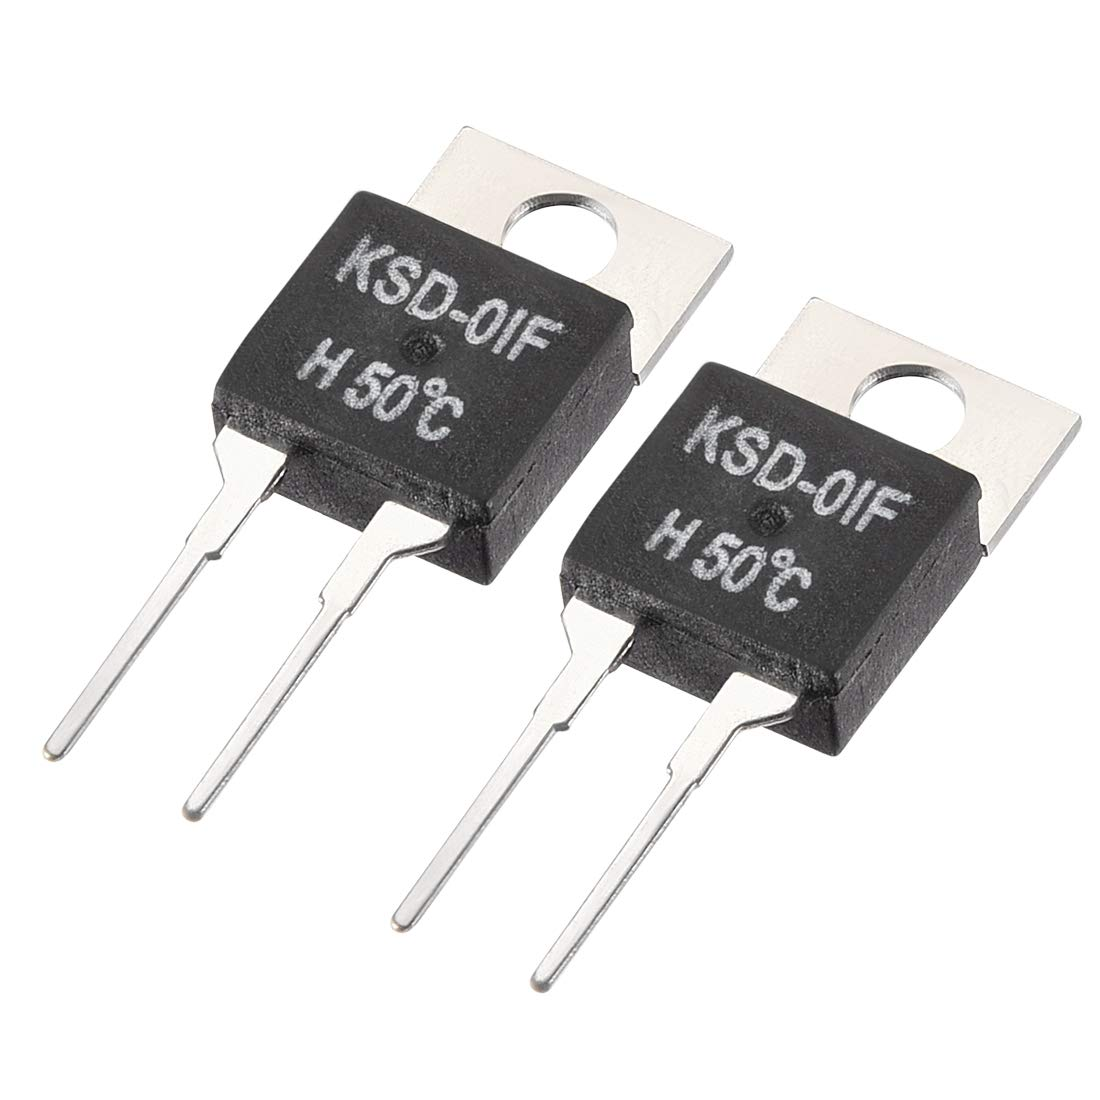 40 Degree Sourcingmap KSD-01F termostato controlador de temperatura N.O Normal Open 2pieza s